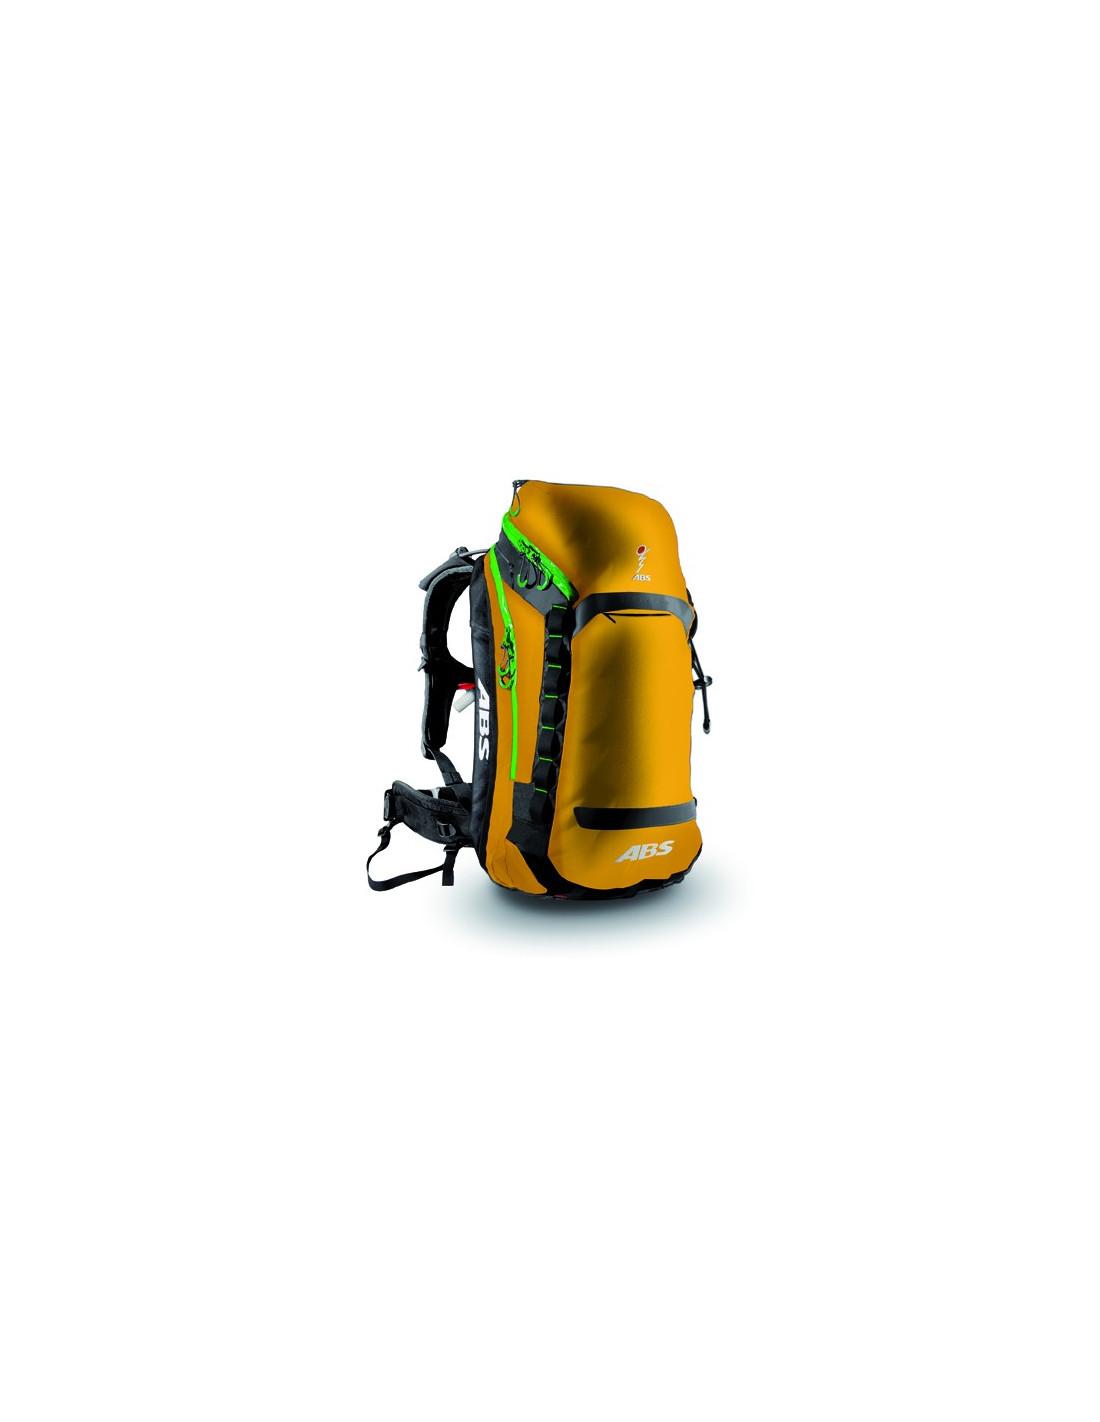 ABS Lawinenairbag Vario Zip-On 30 l Rucksackart - Lawinen, Rucksackvolumen - 26